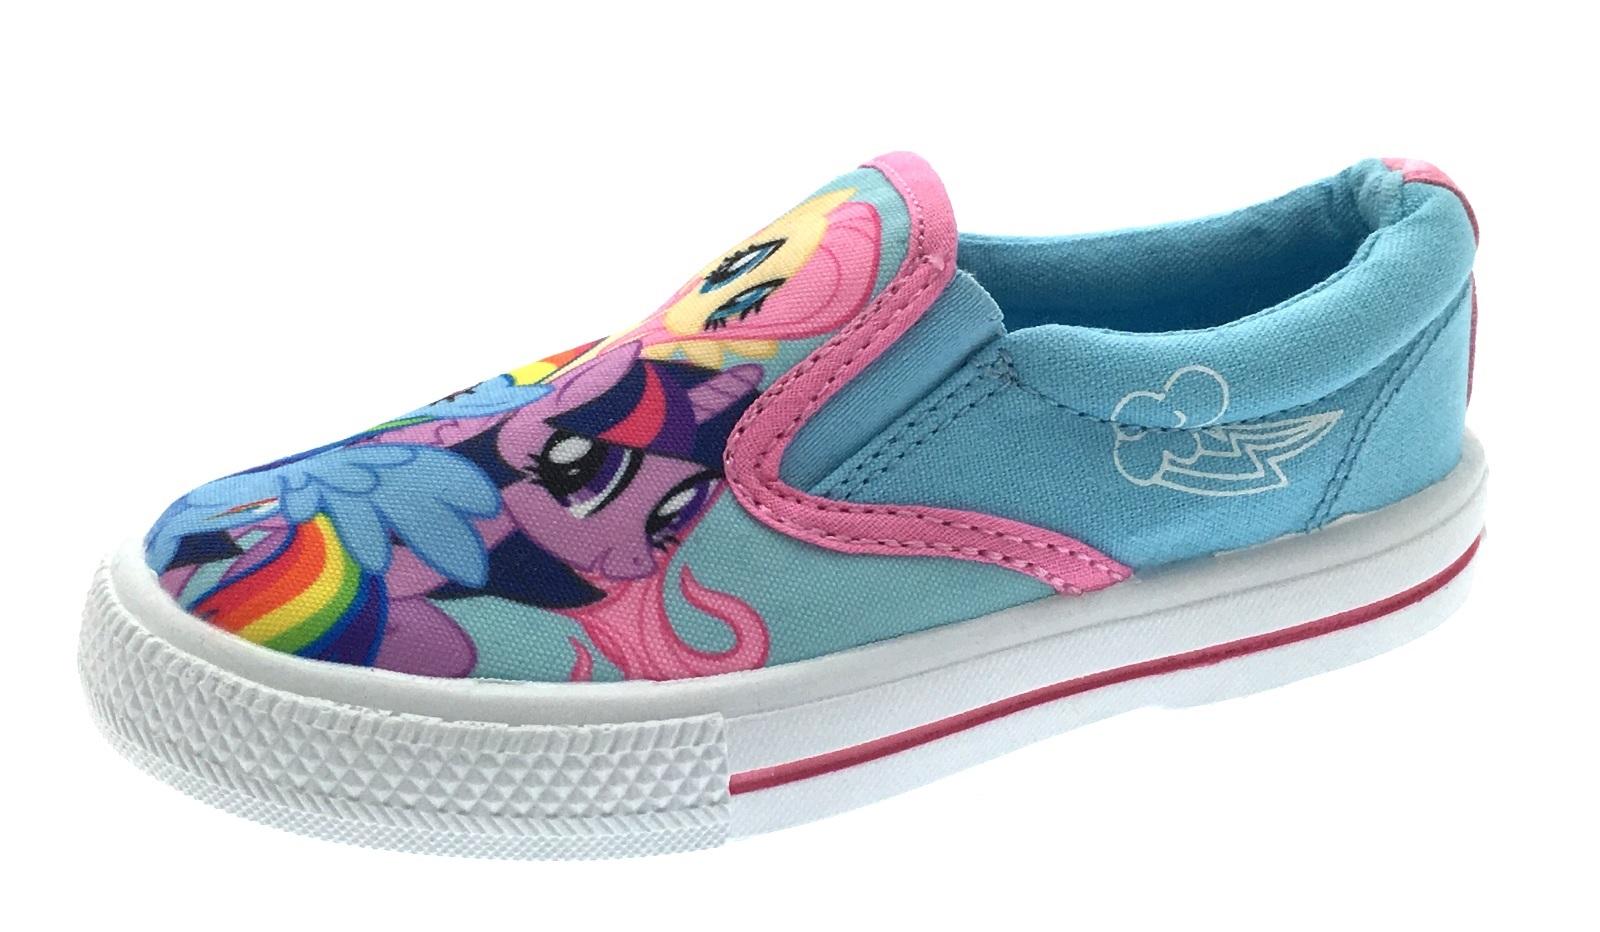 quality design 221a3 736c6 scarpe my little pony